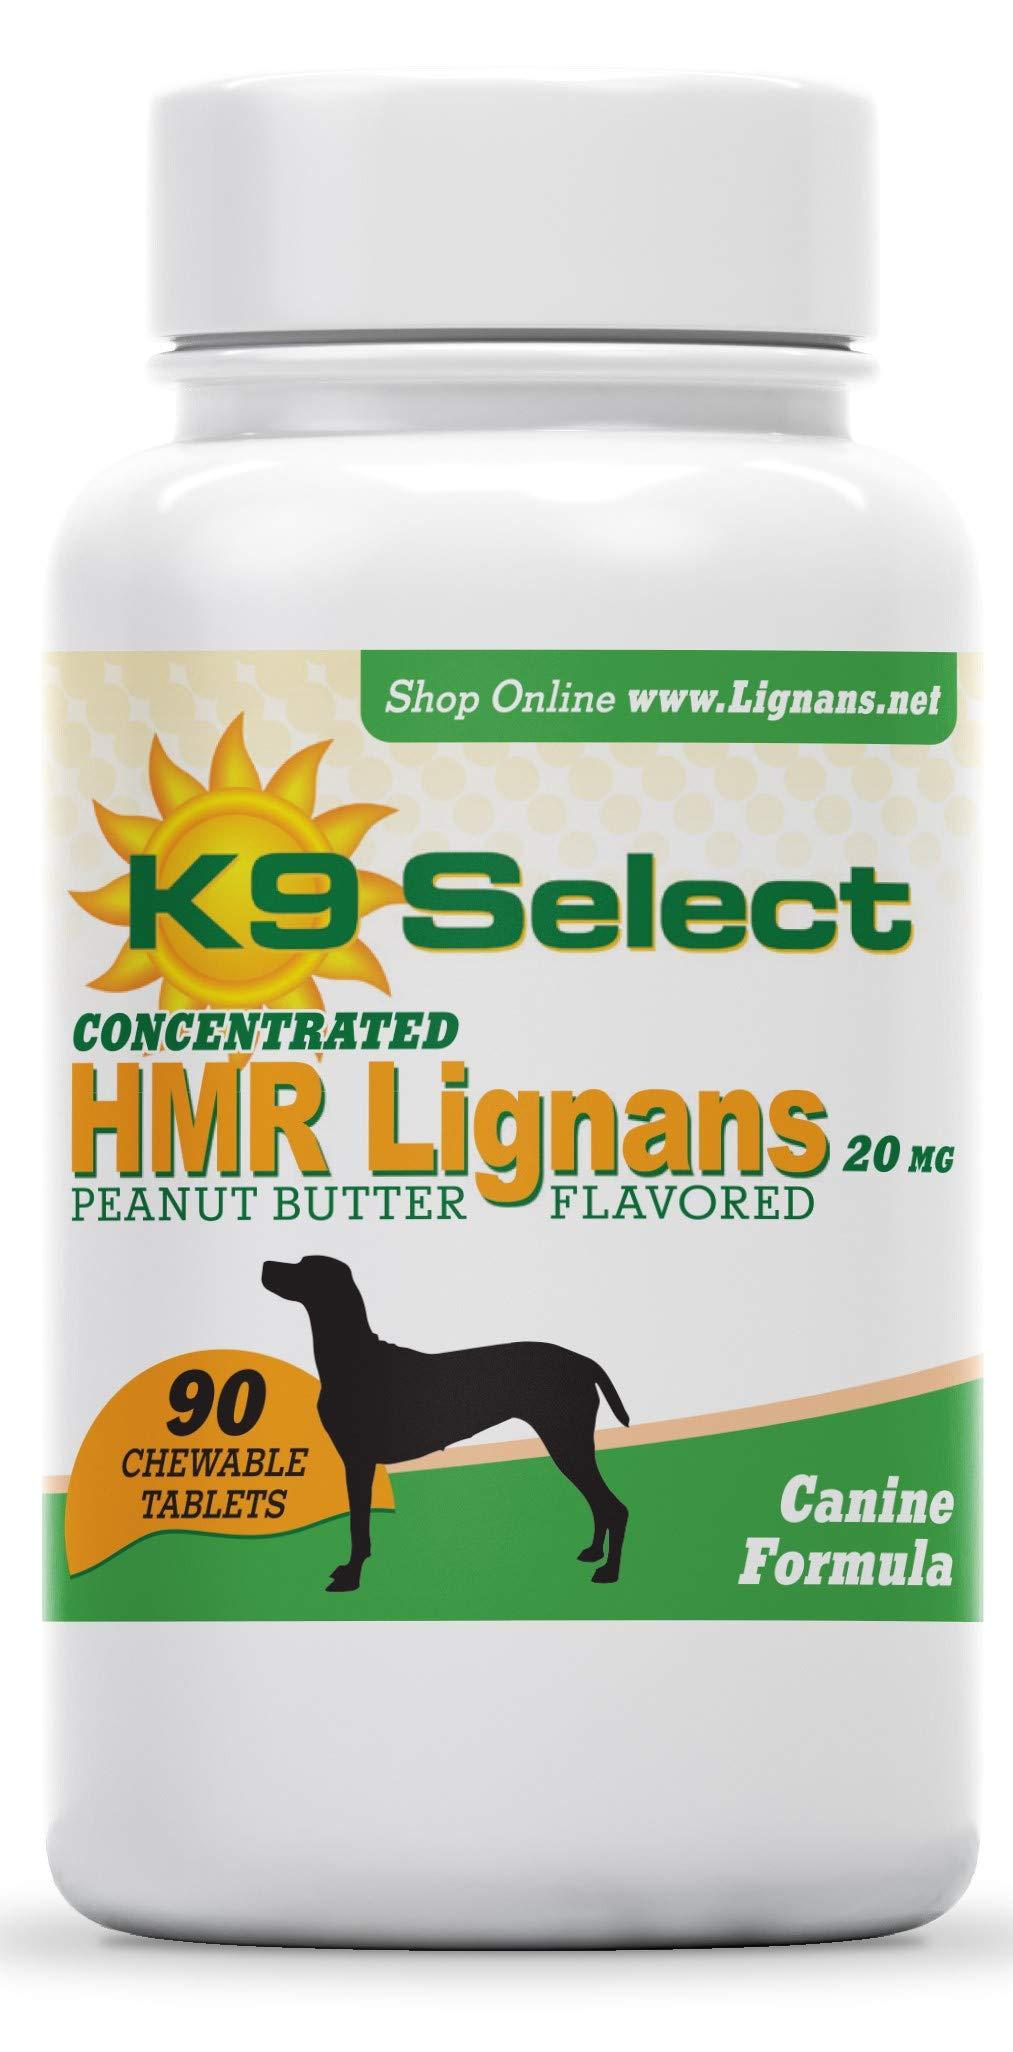 K9 Select HMR Lignans 20 mg Peanut Butter Chewable